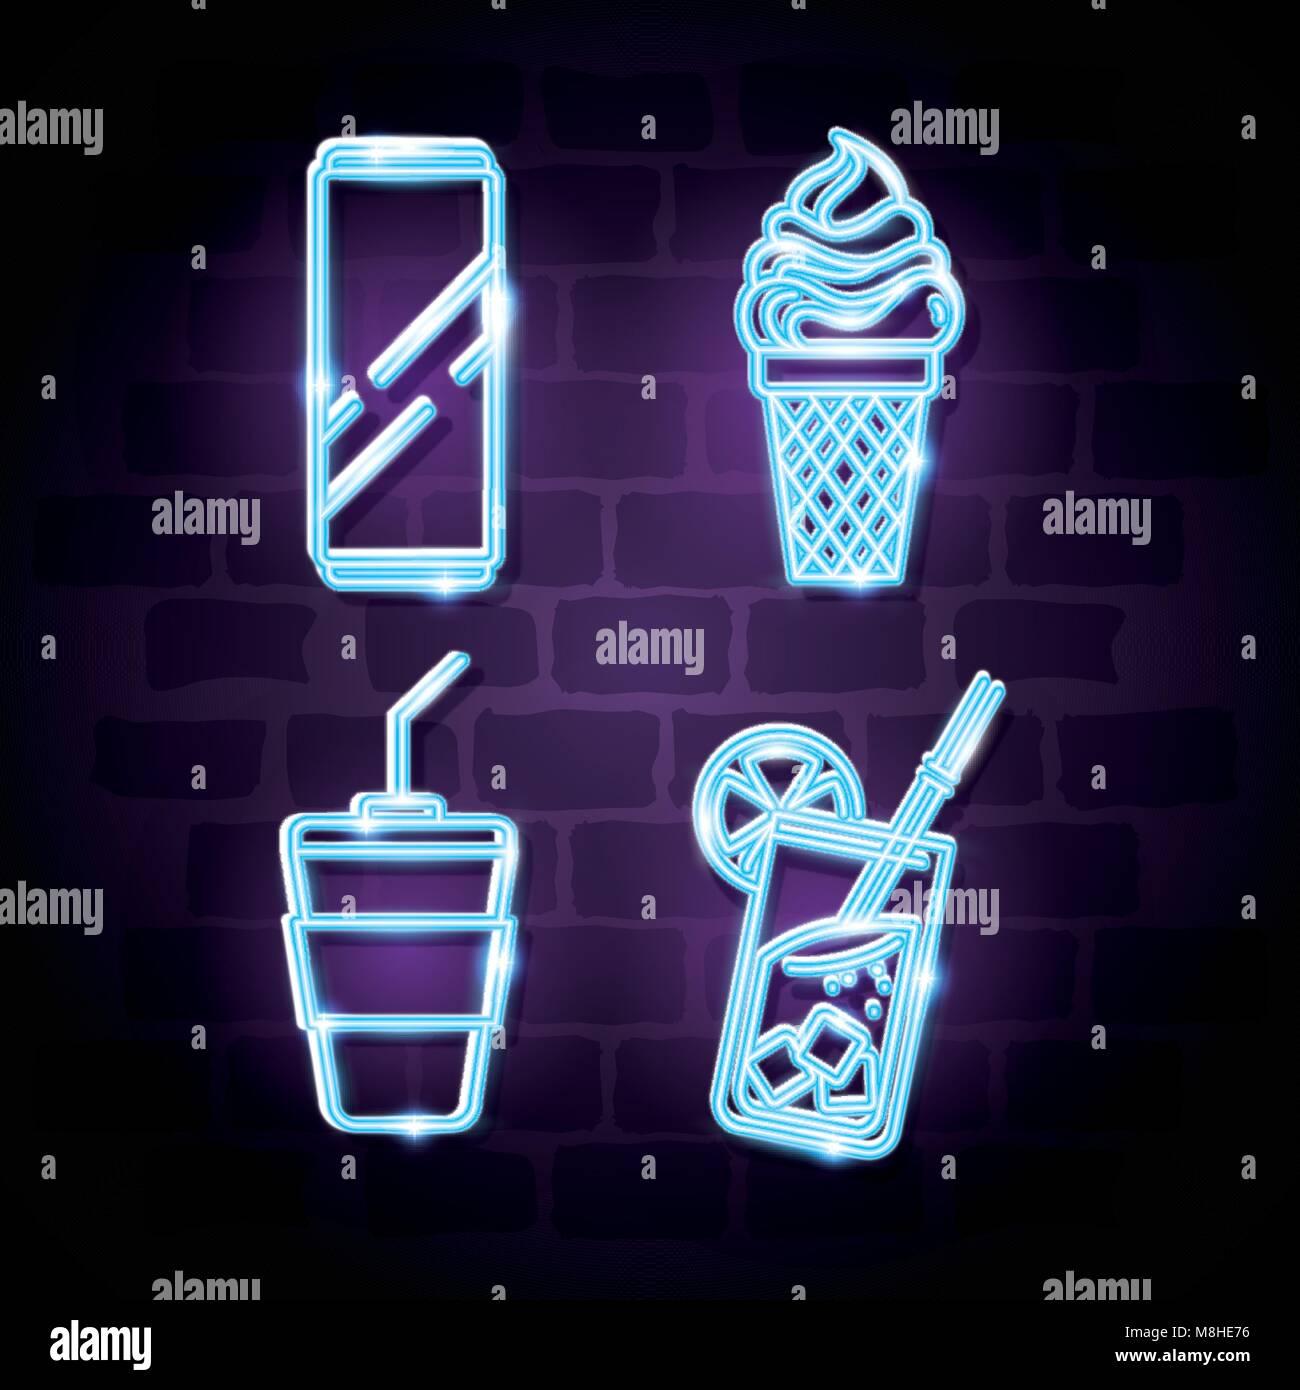 Neon Lettering Bar Stockfotos & Neon Lettering Bar Bilder - Seite 2 ...